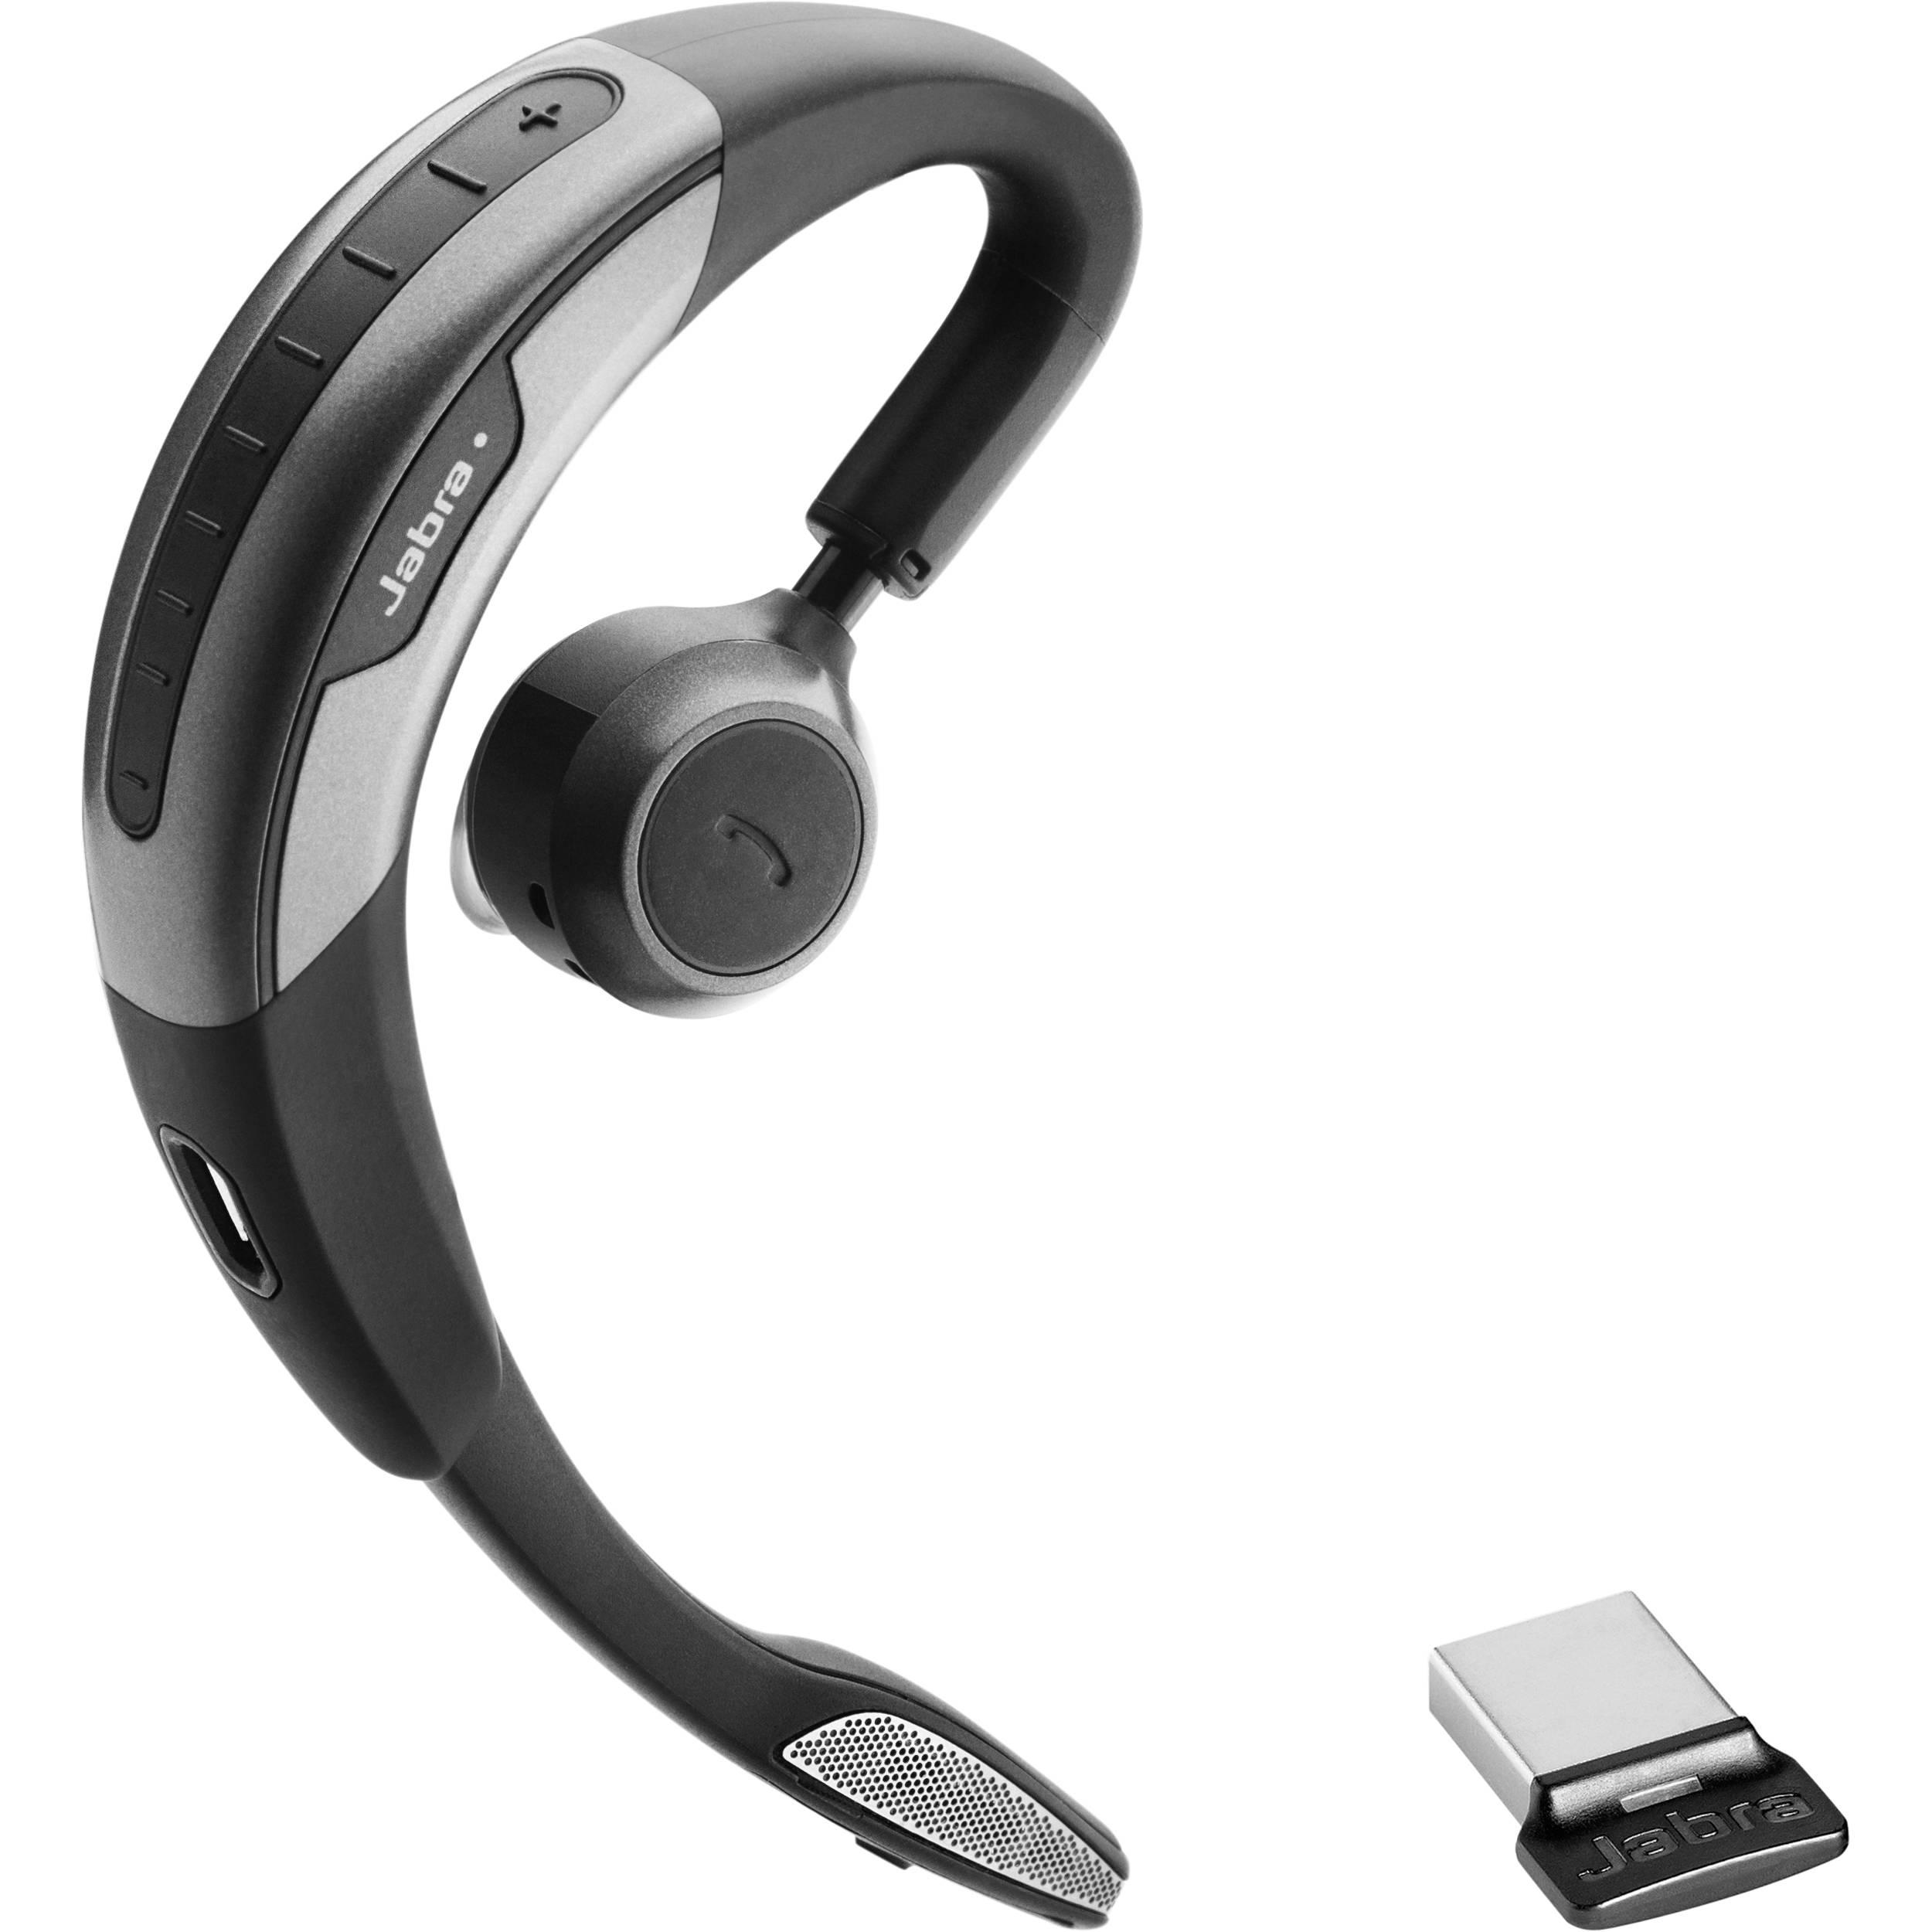 Jabra Motion UC MS USB Wireless Headset with Dongle